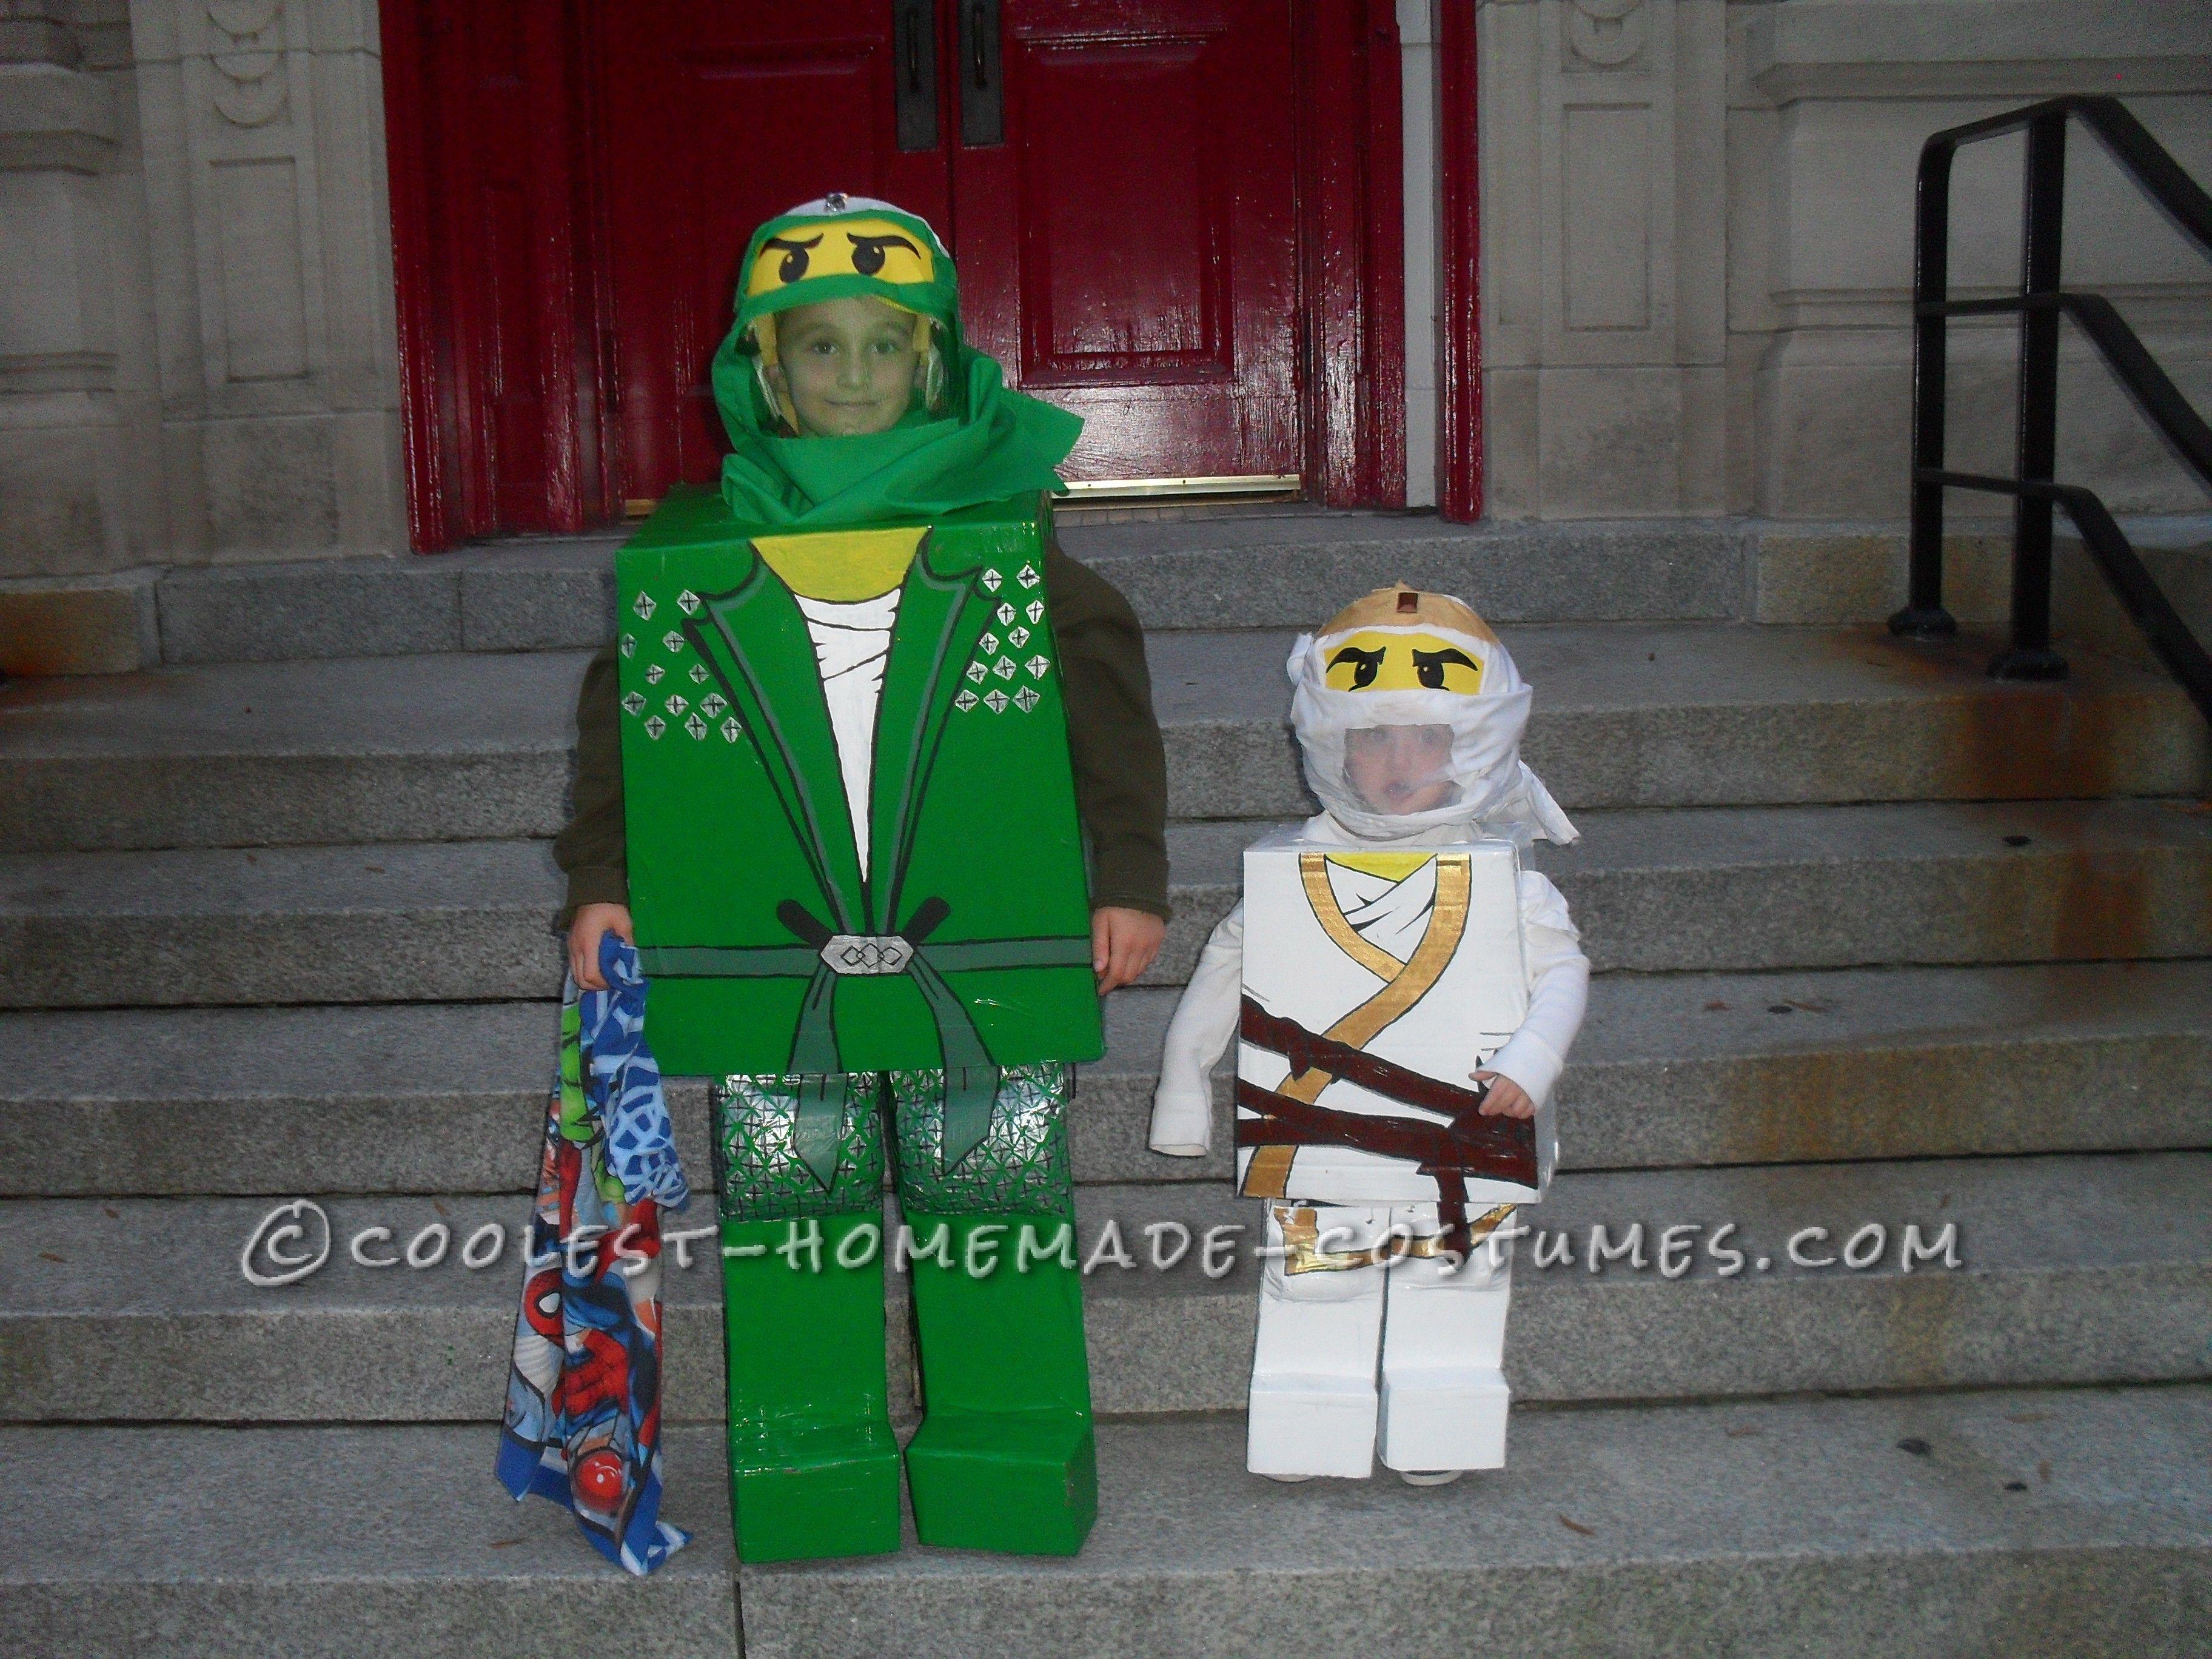 Best DIY Lego Ninjago Brothers Costumesu2026 Coolest Halloween Costume Contest  sc 1 st  Pinterest & Best DIY Lego Ninjago Brothers Costumes | Pinterest | Lego ninjago ...